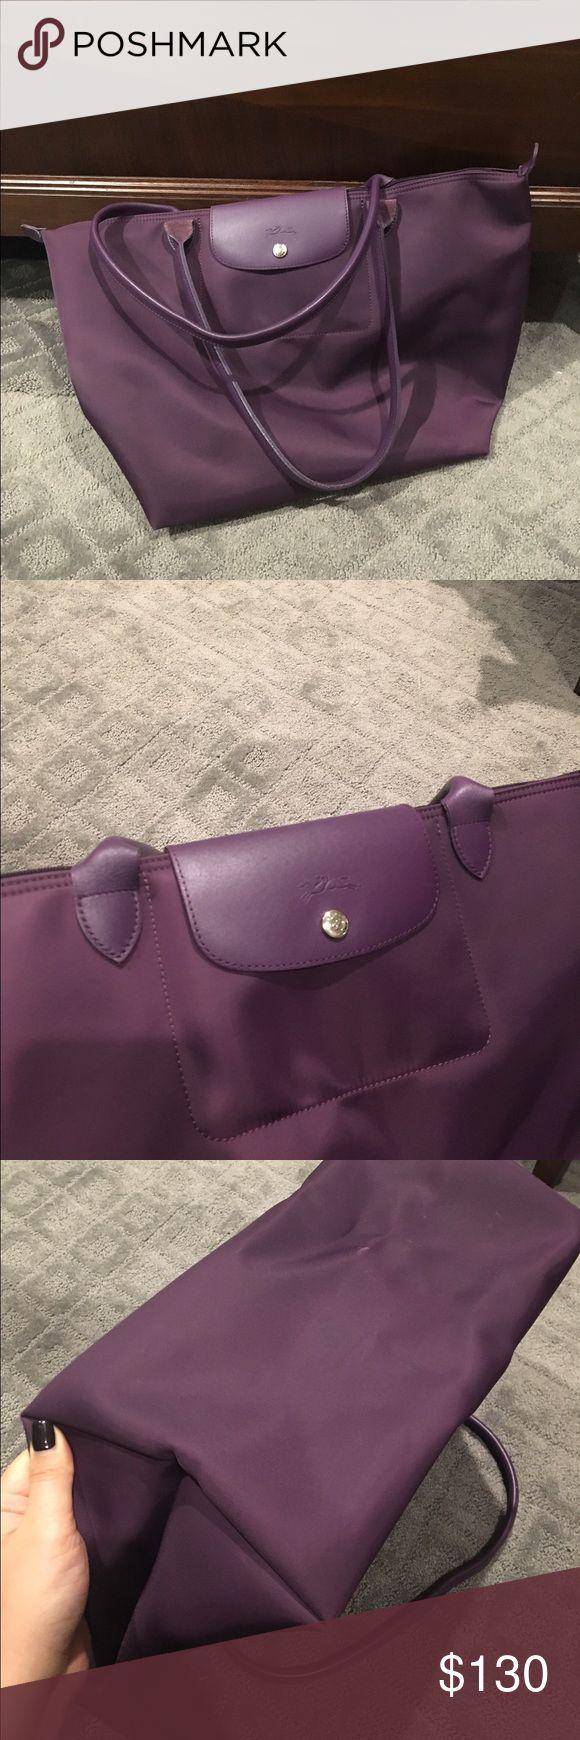 Longchamp Le Pliage Large Travel Bag In Myrtille   ReGreen Springfield ede5266b34